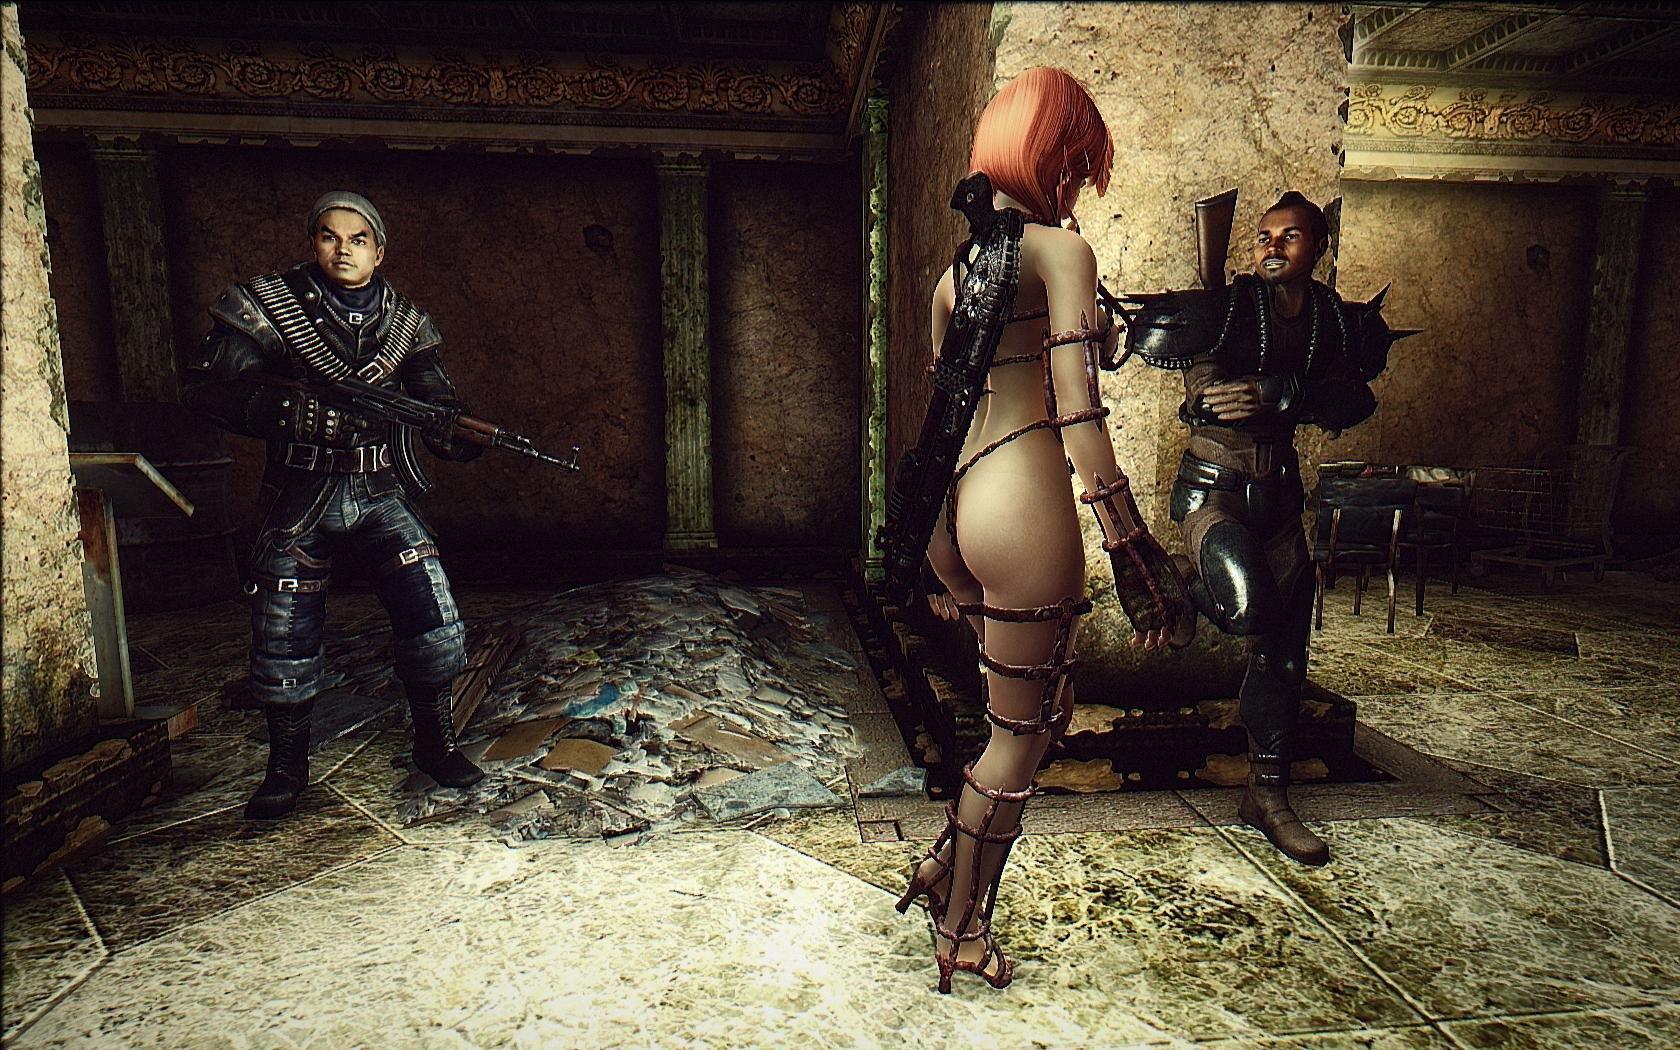 Fallout3 2019-06-19 10-11-56-73